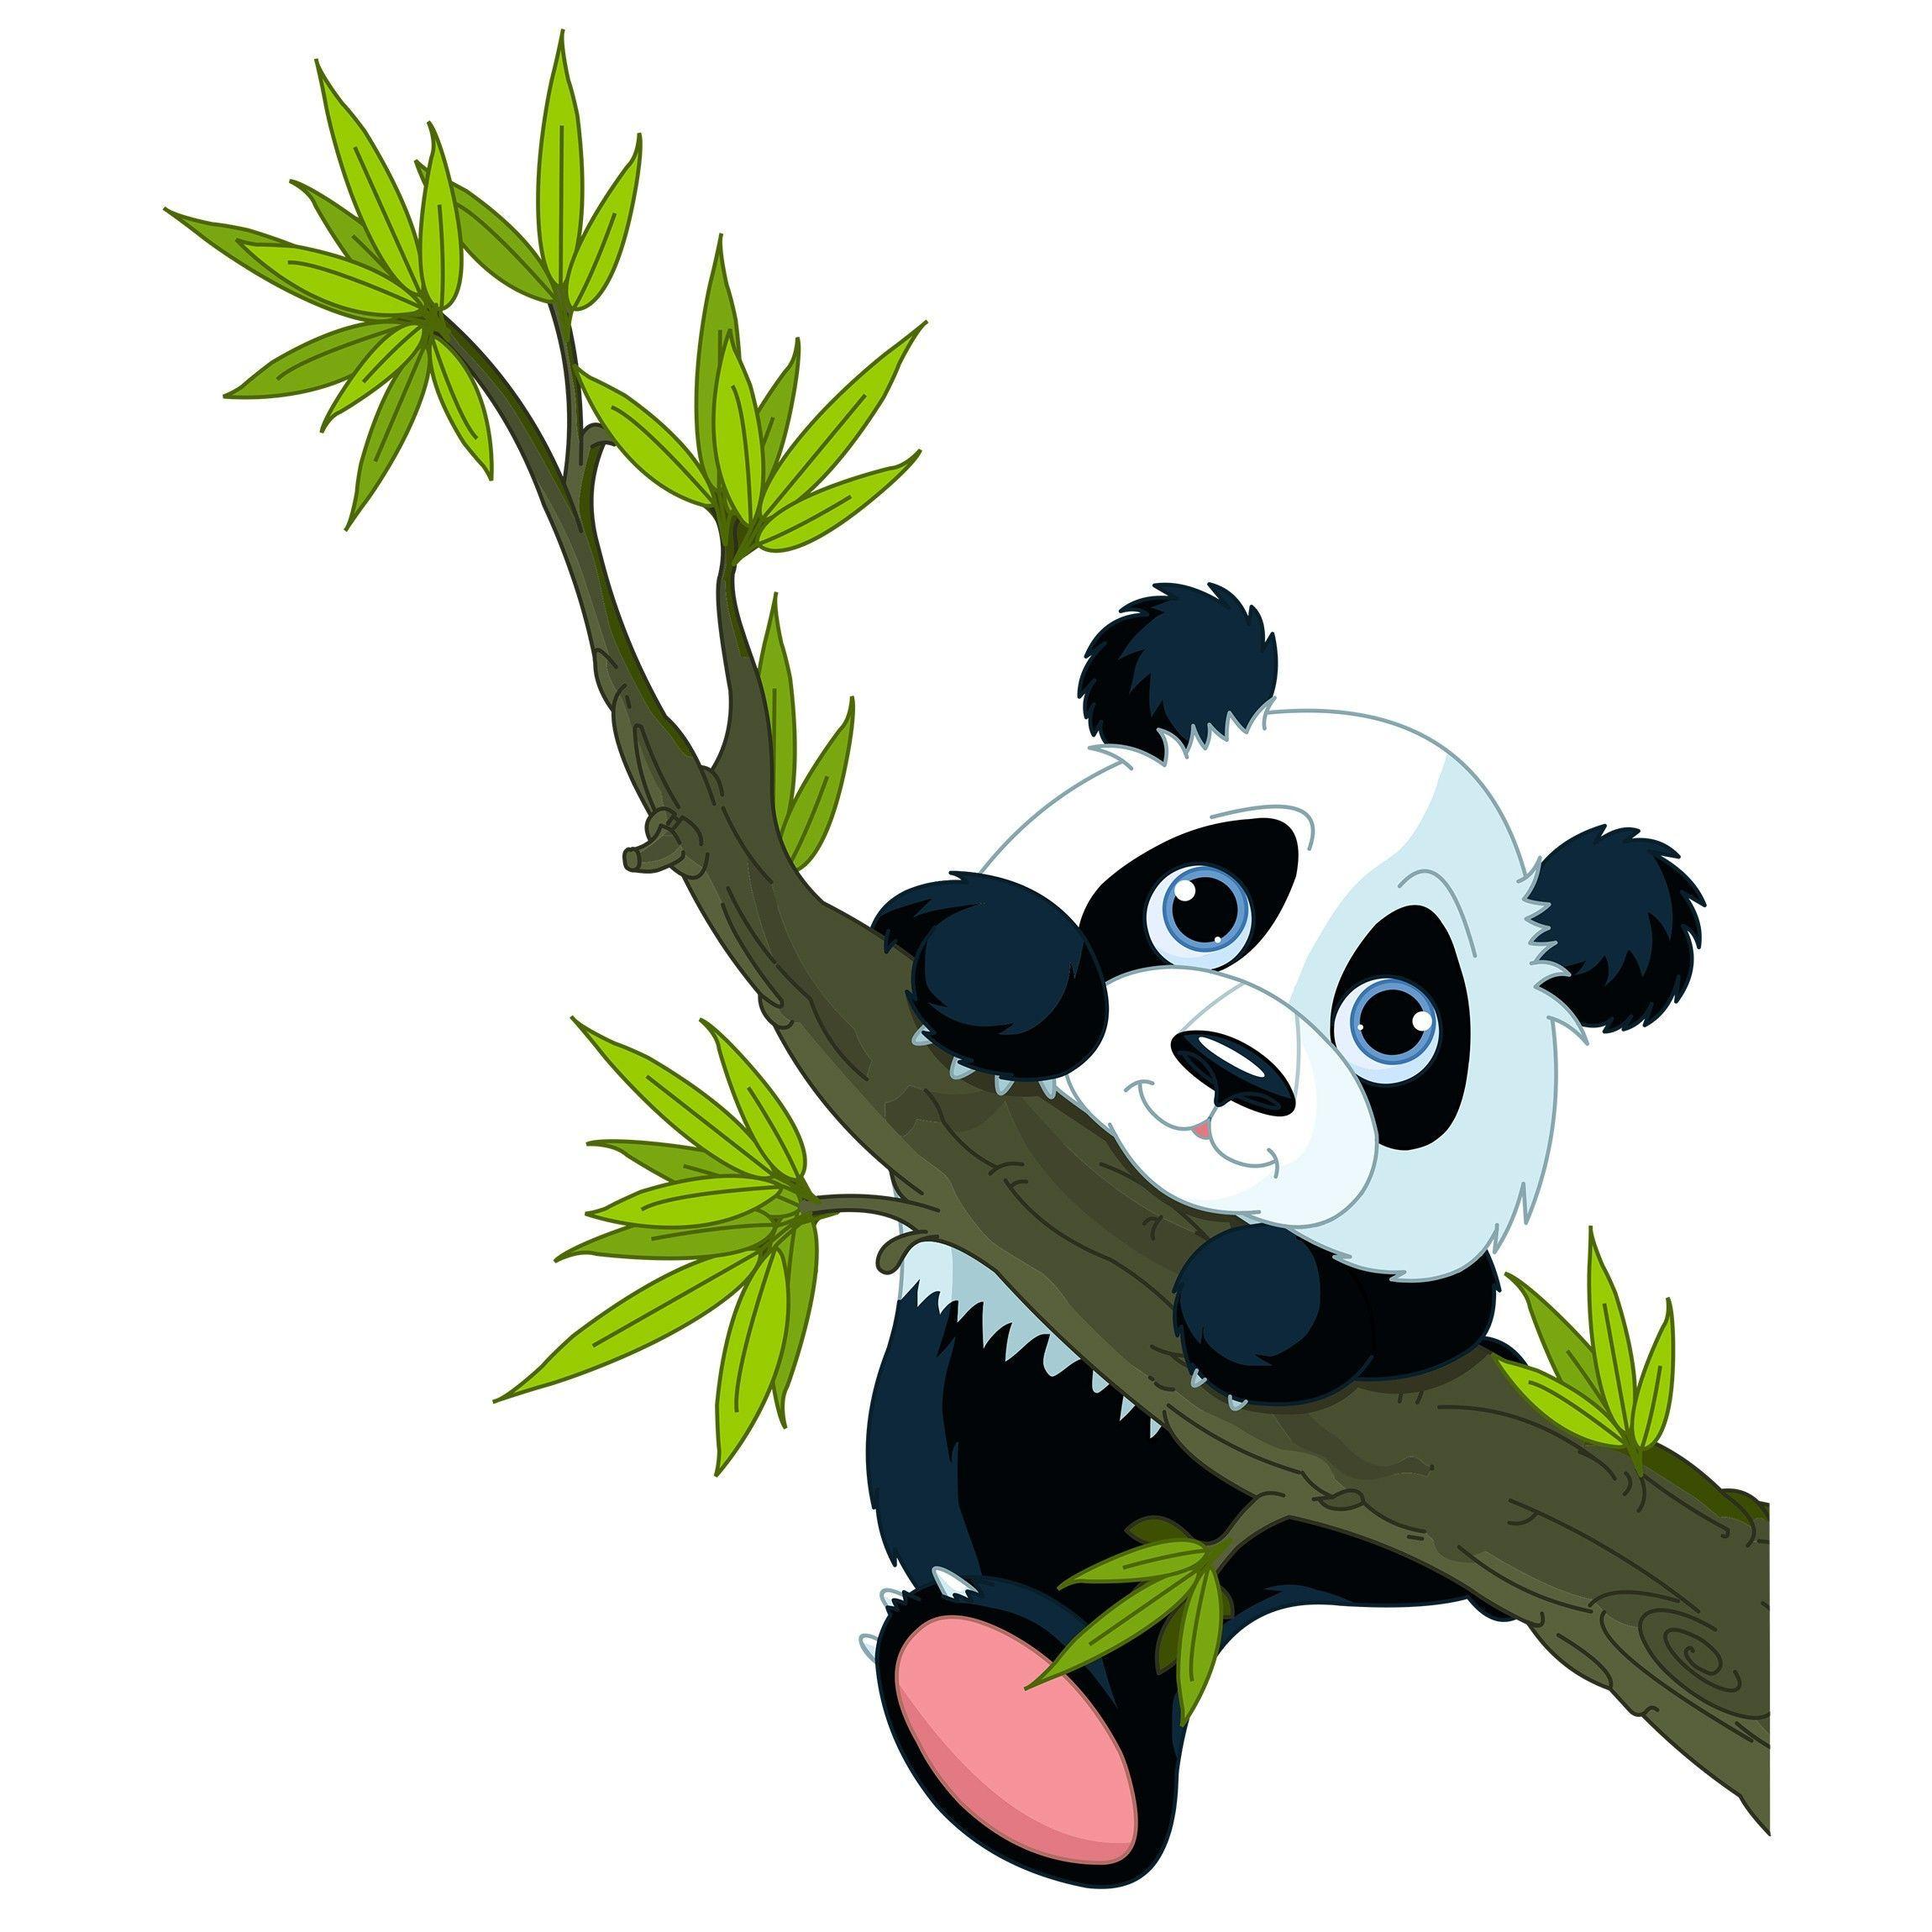 Wandtattoo Kletternder Panda Gambar Hewan Gambar Hewan Lucu Binatang